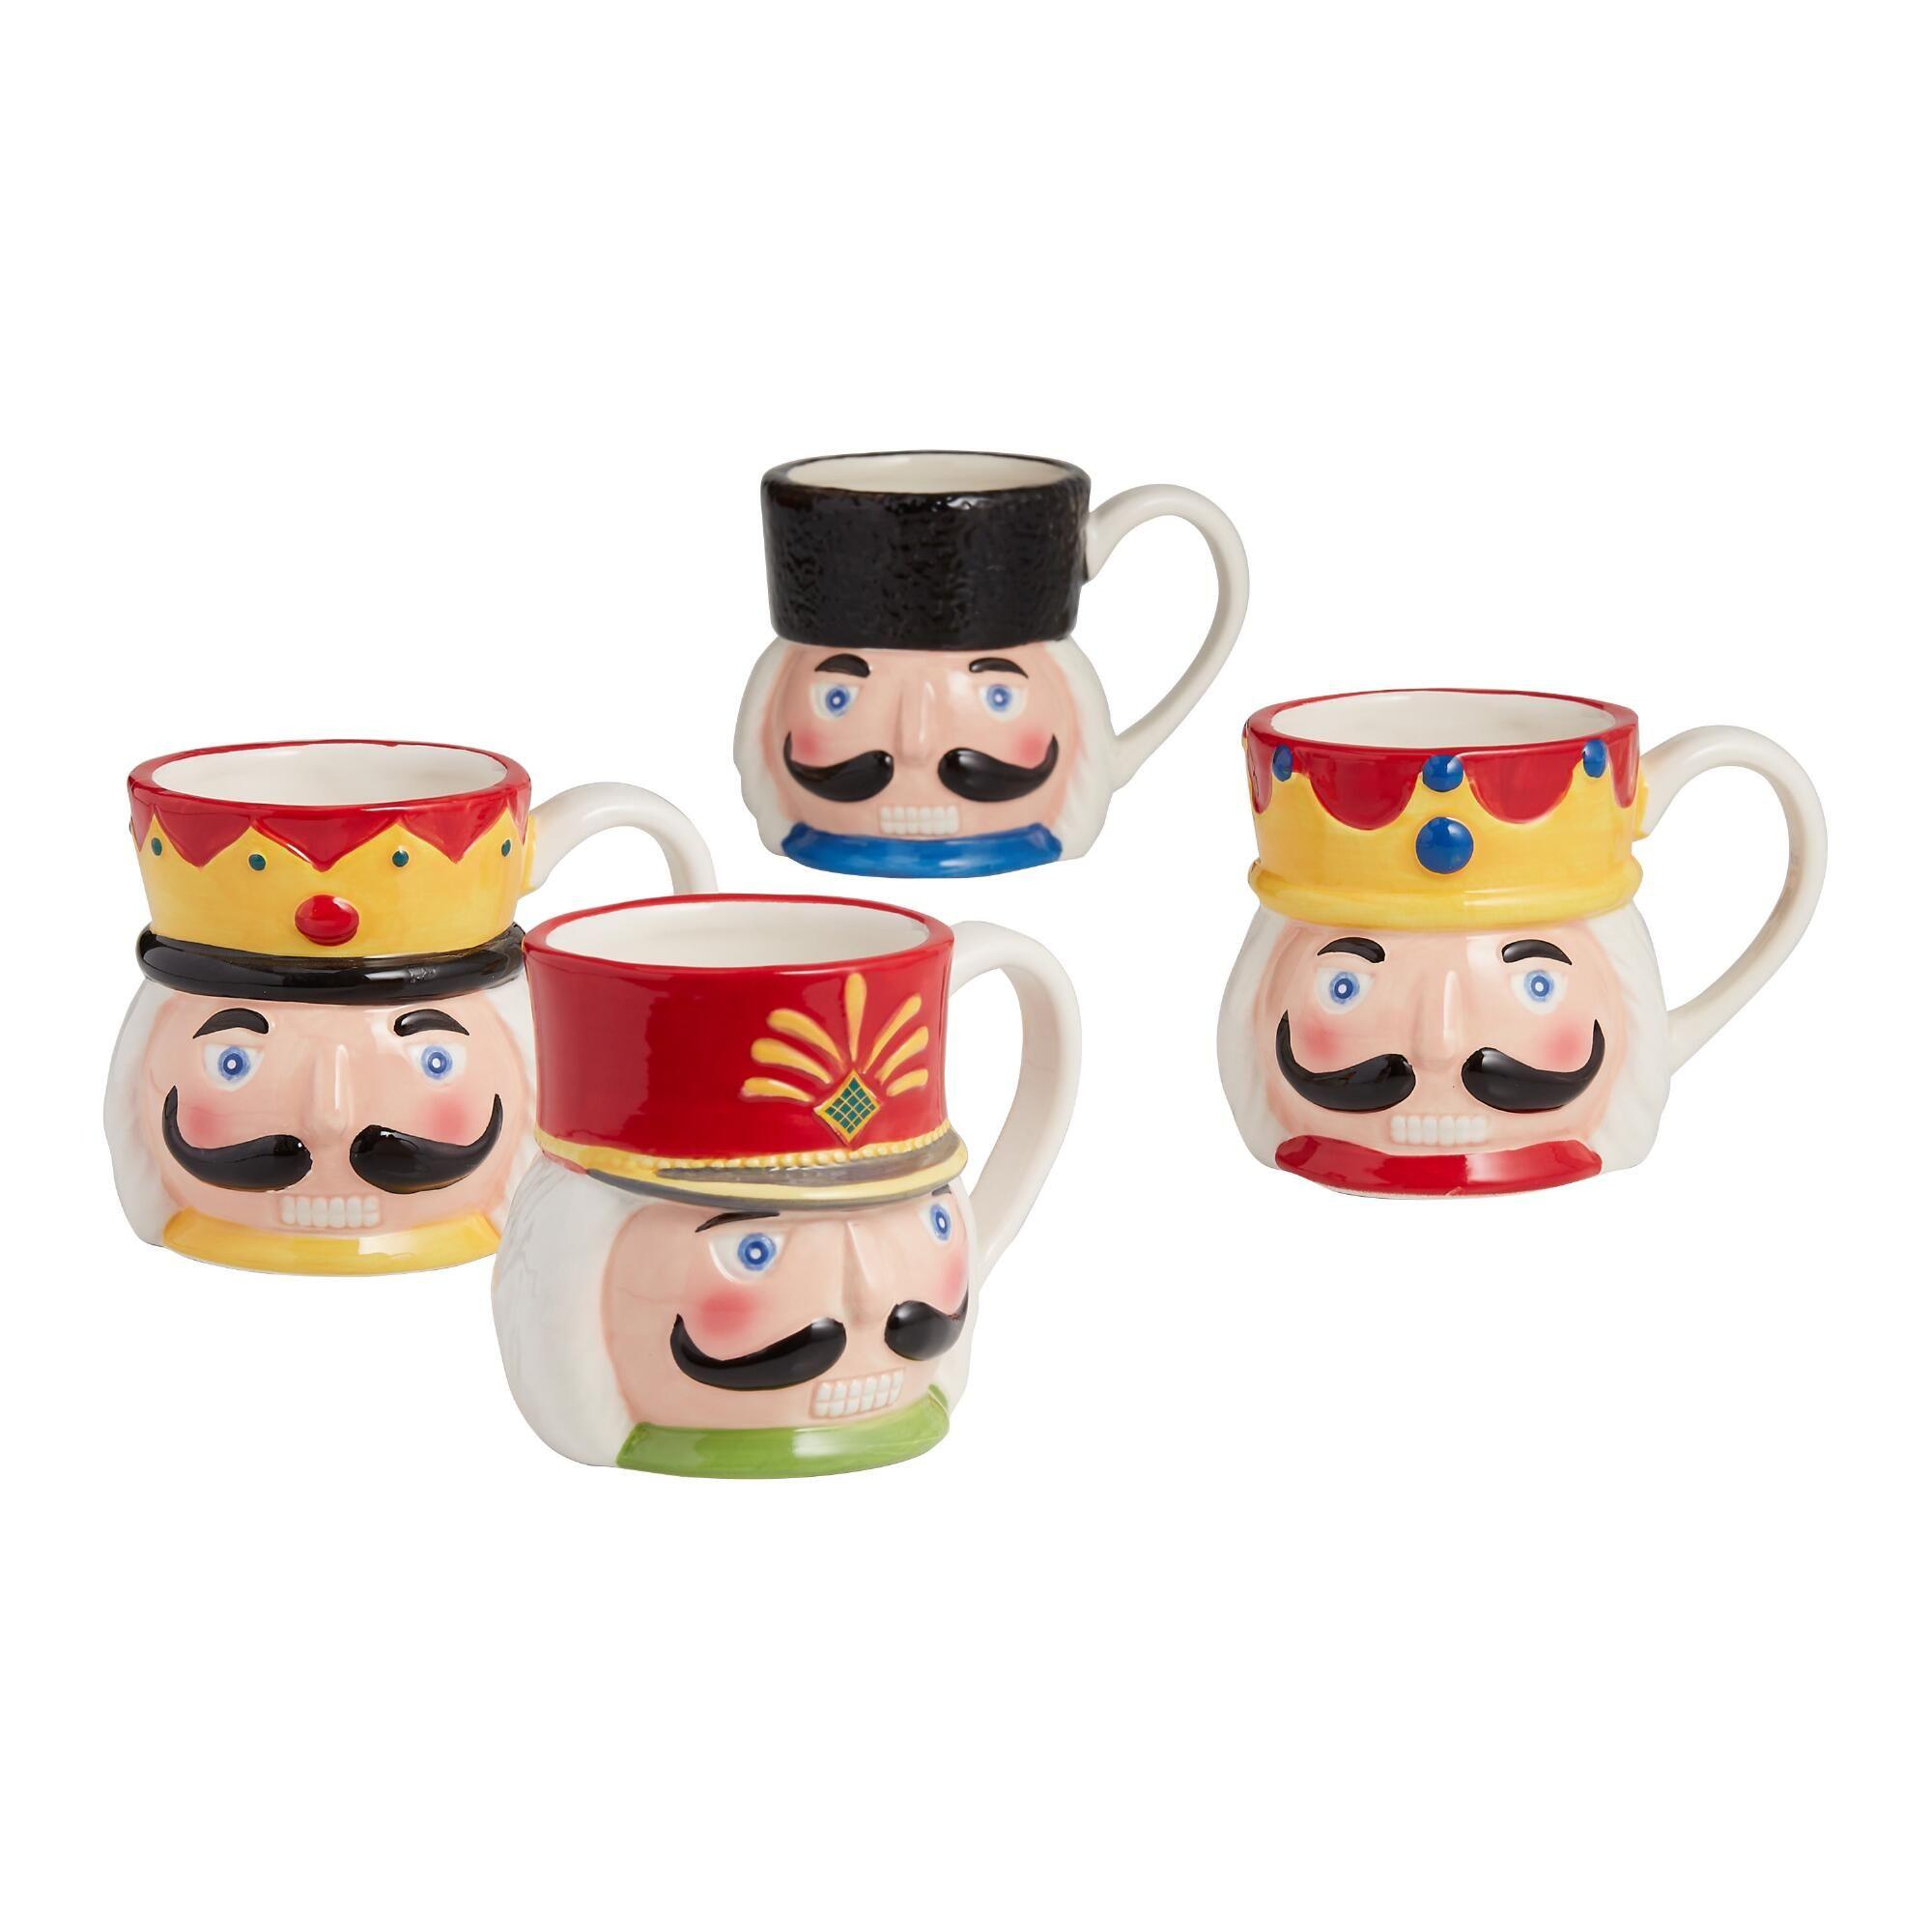 Nutcracker Mugs Set of 4 by World Market Unique coffee